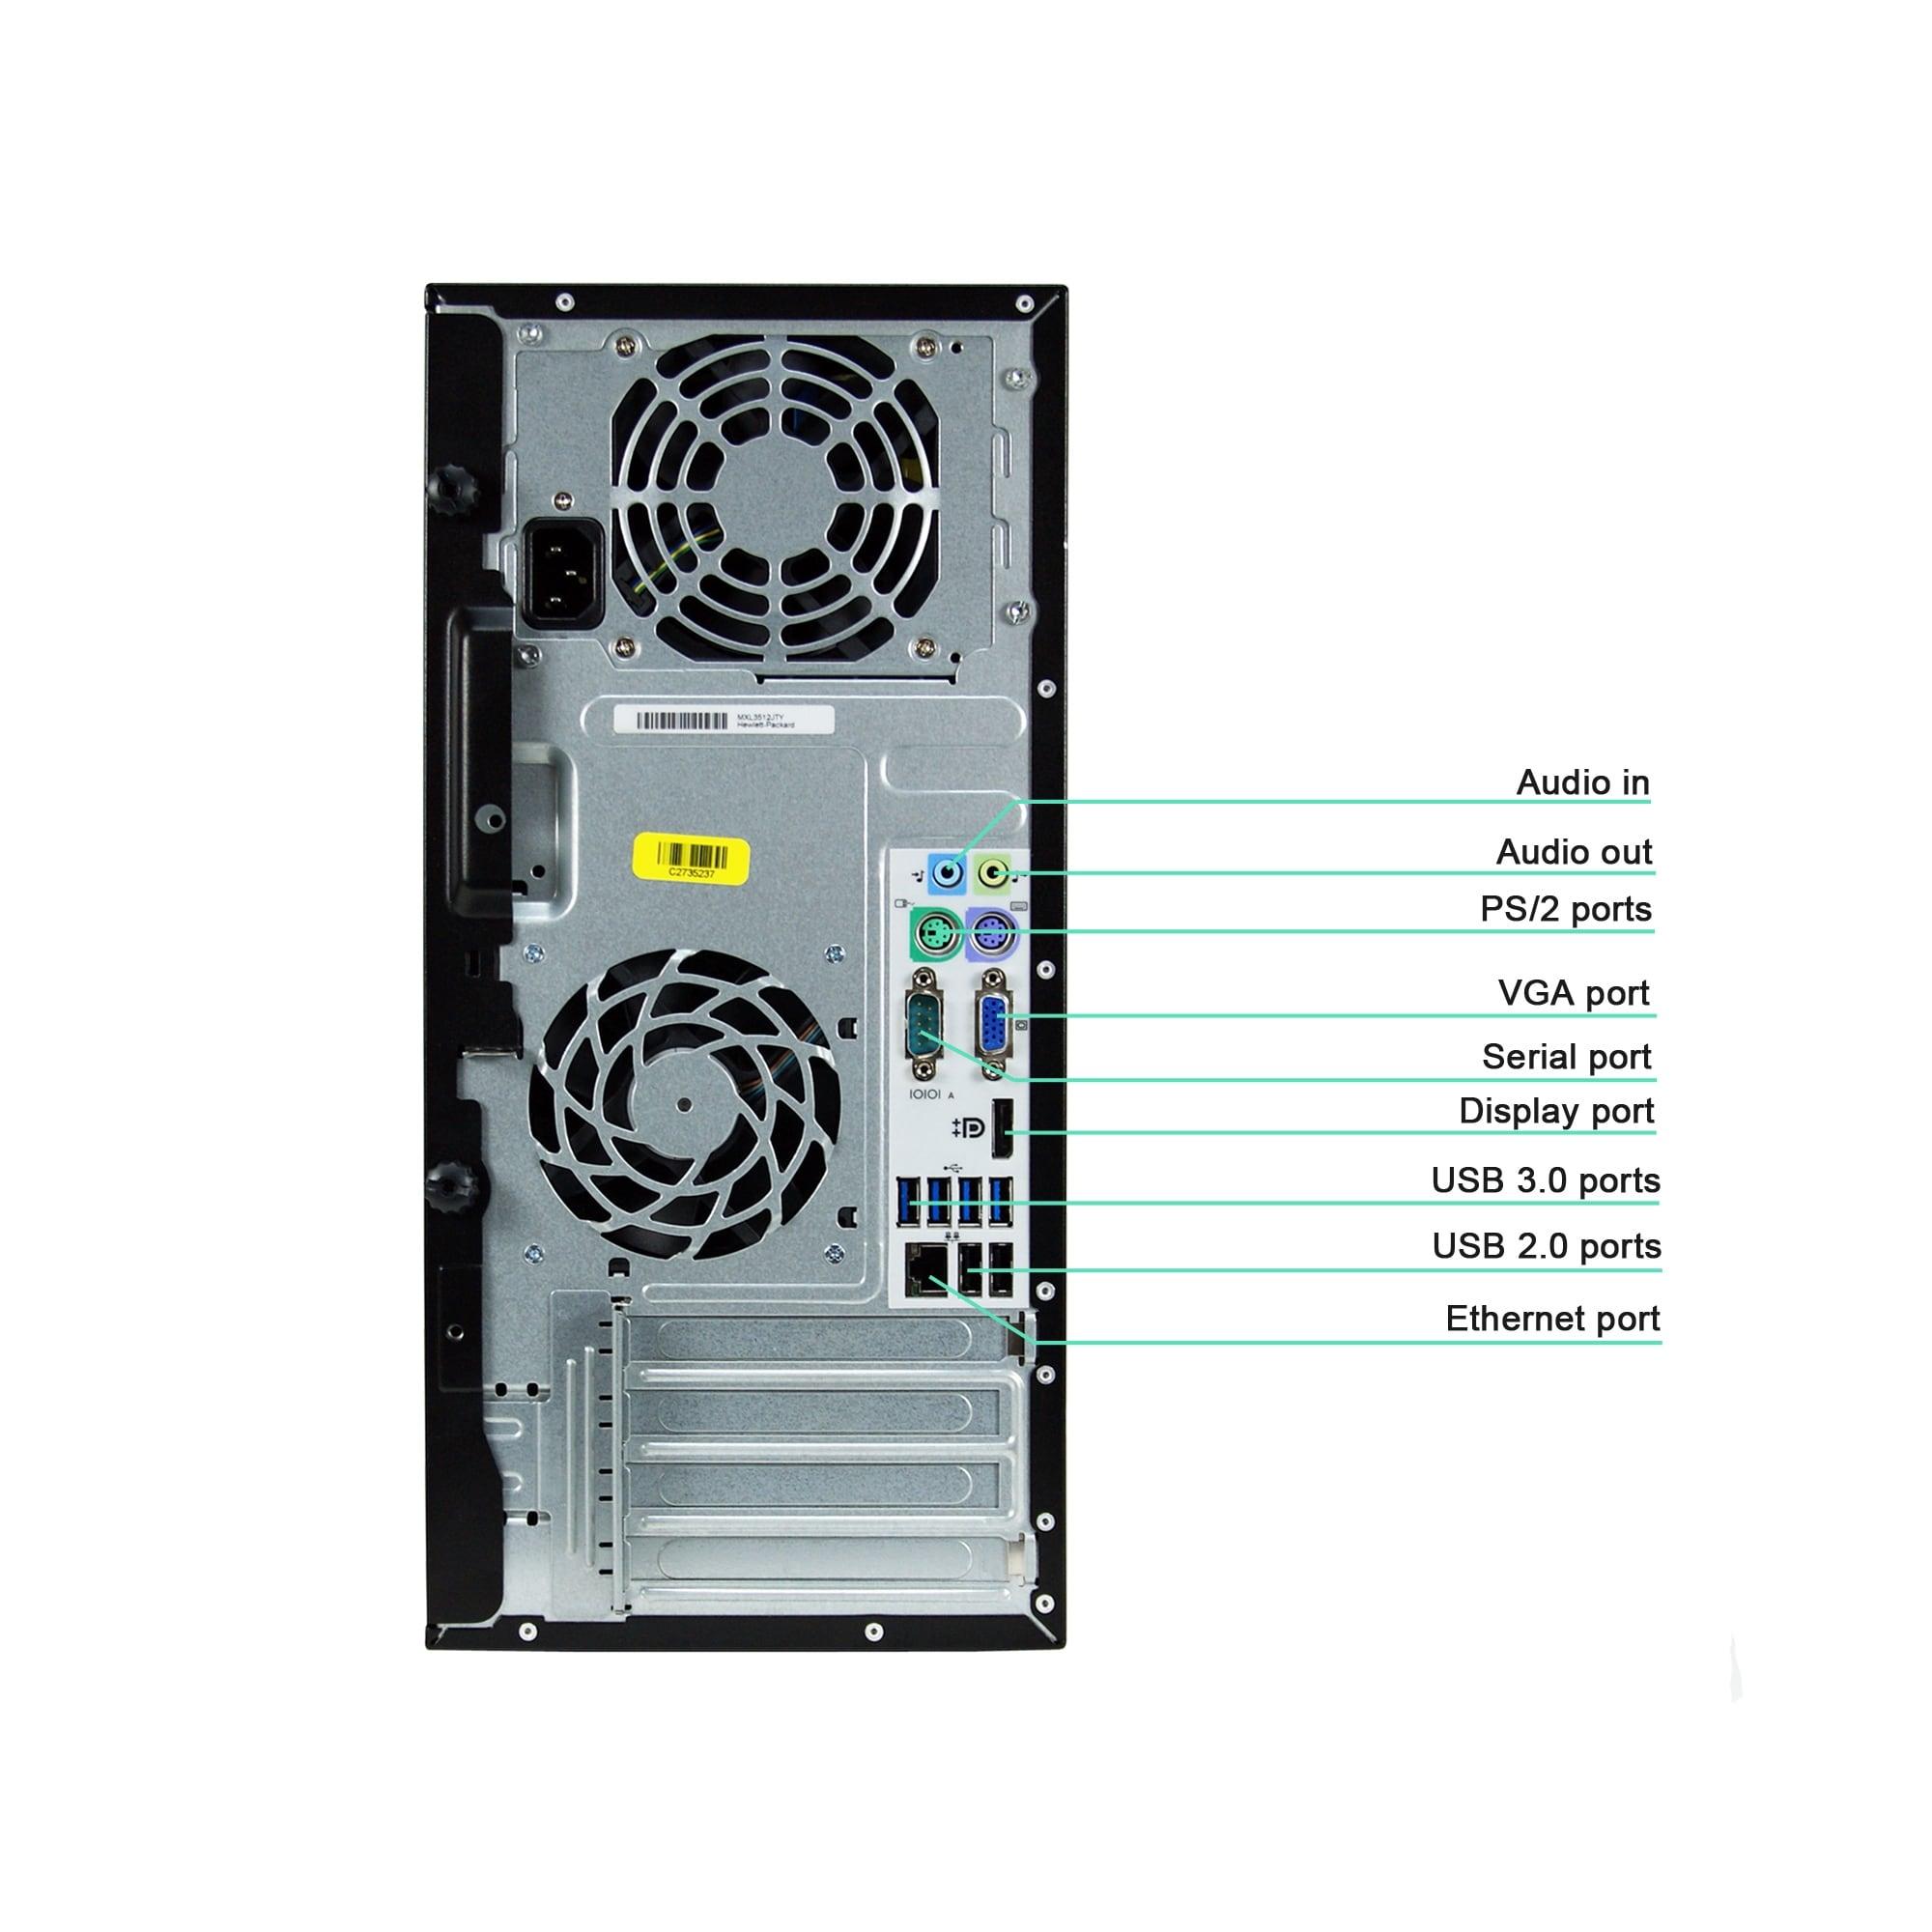 HP Compaq Pro 6305-T A8-5500B 3 2GHz CPU 8GB RAM 500GB HDD DVD-RW Windows  10 Pro PC (Refurbished)